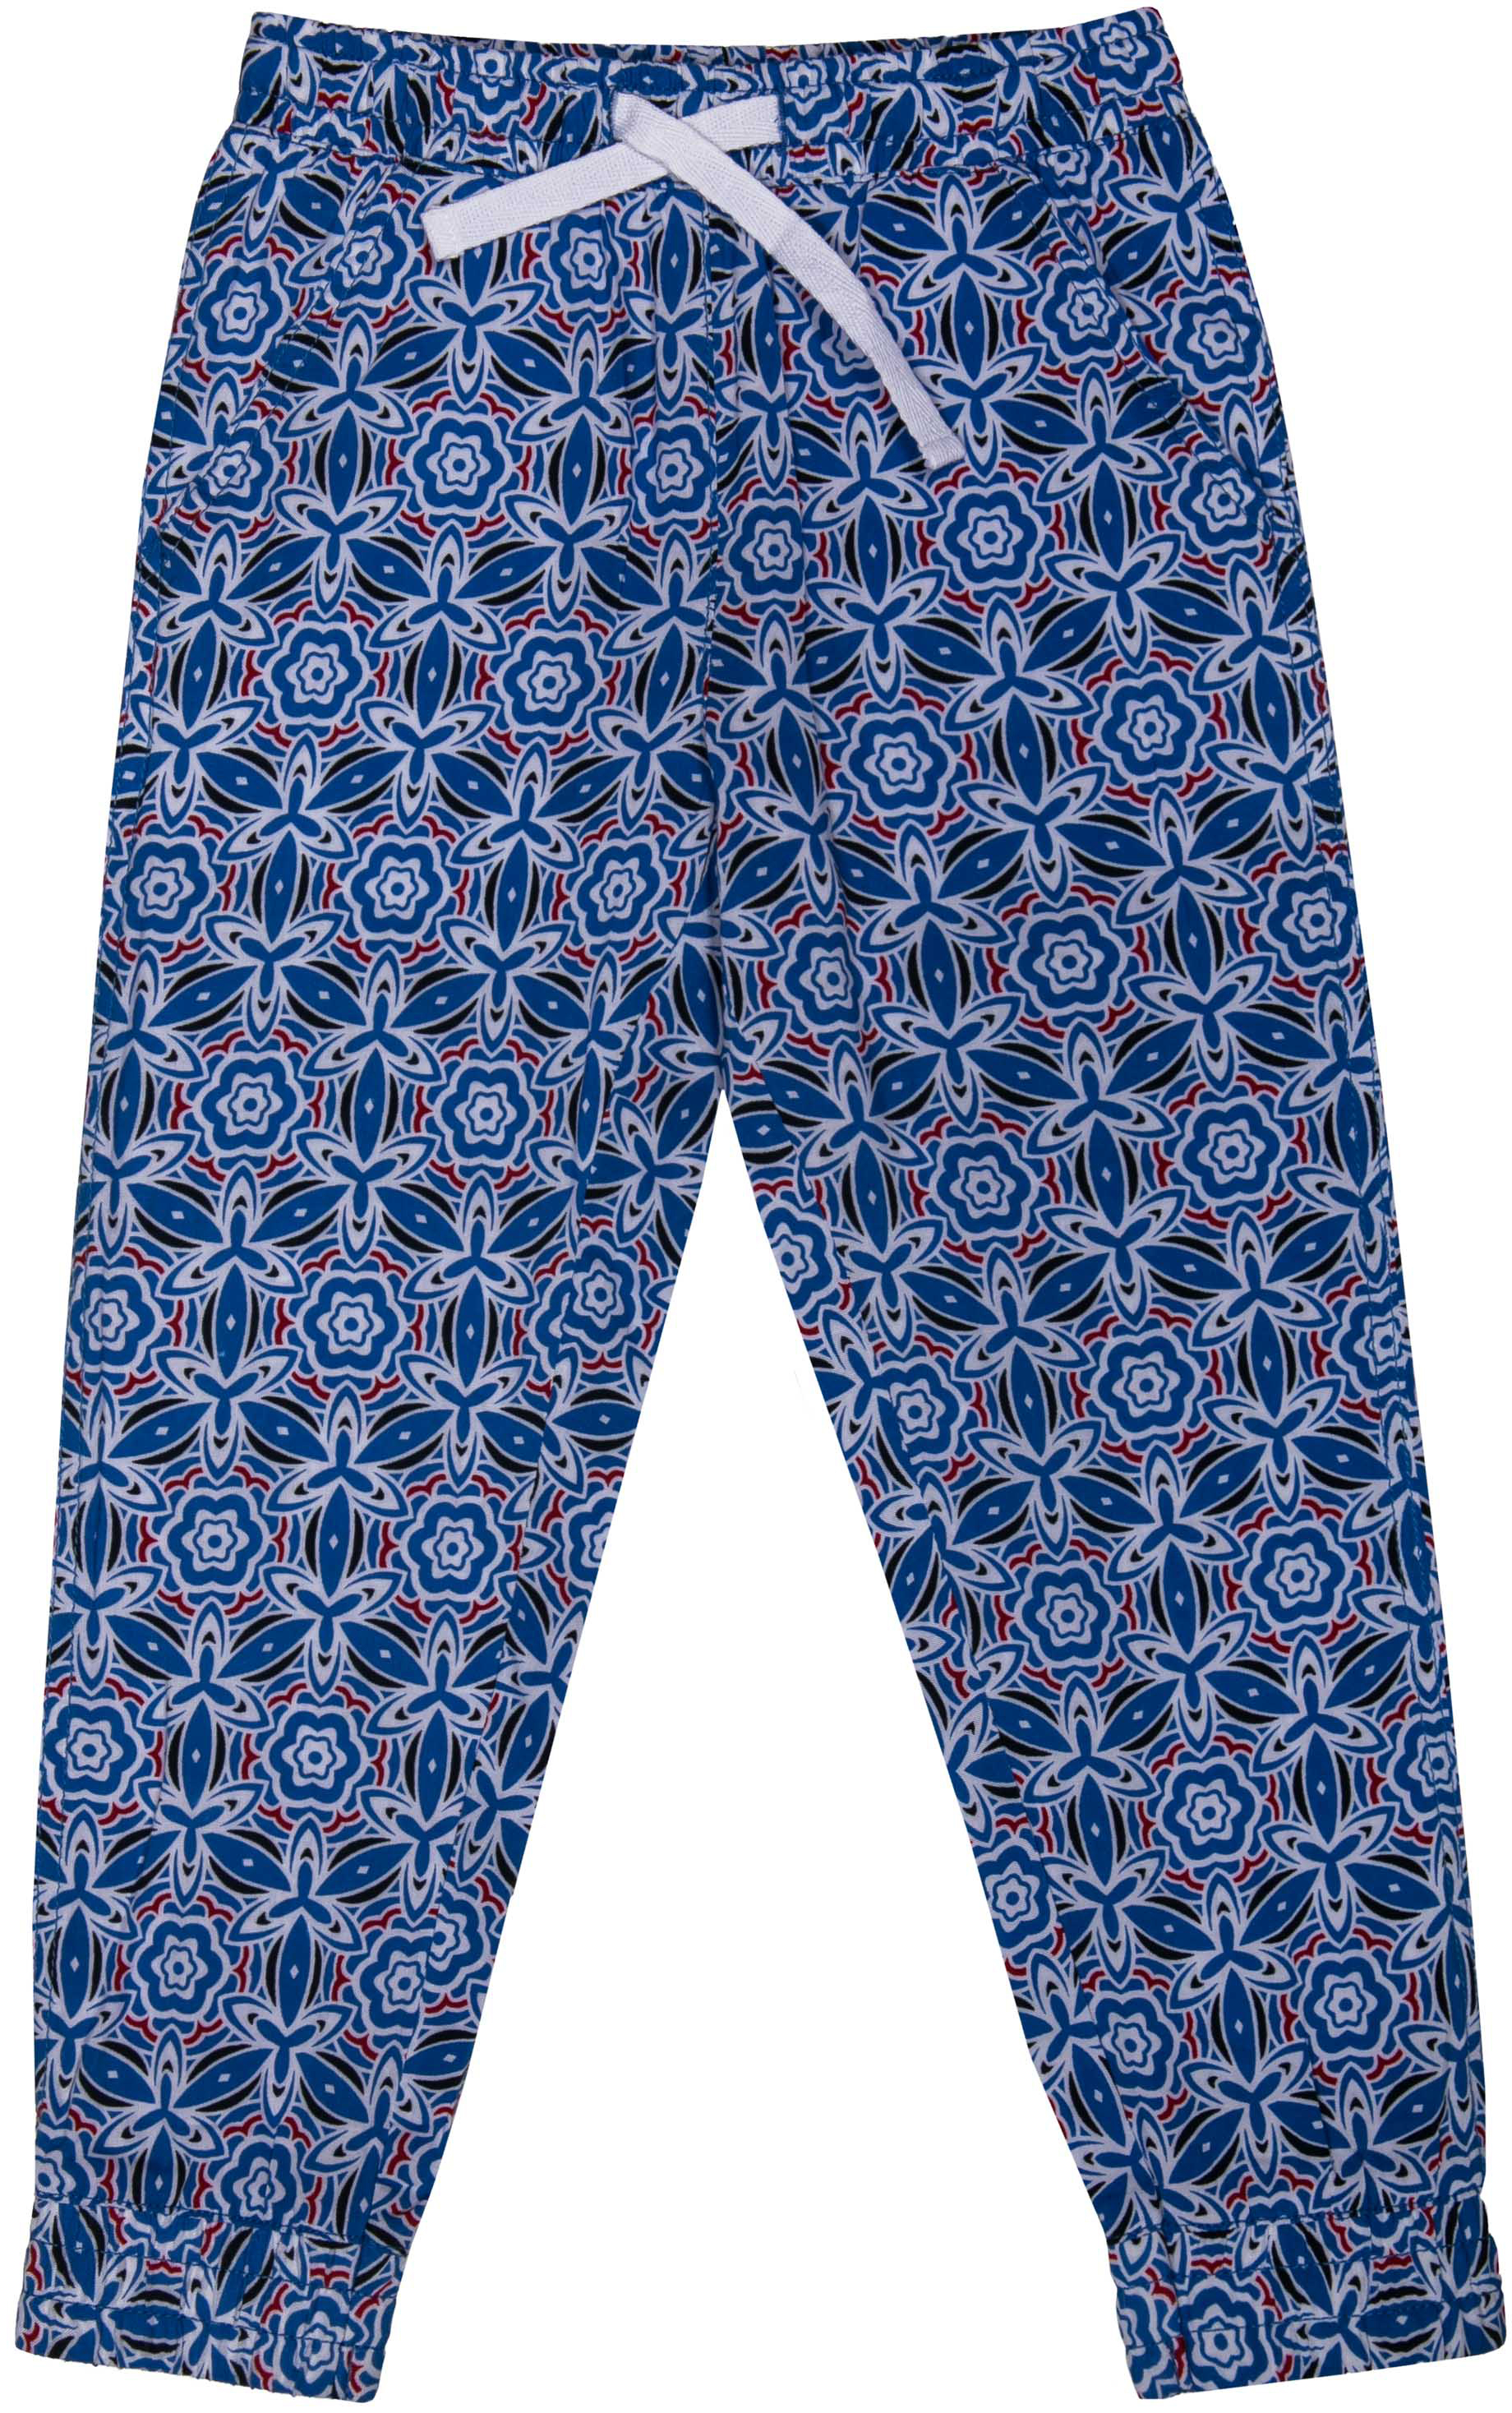 Брюки Barkito Фантазия S18G3014W(1) брюки дудочки с рисунком